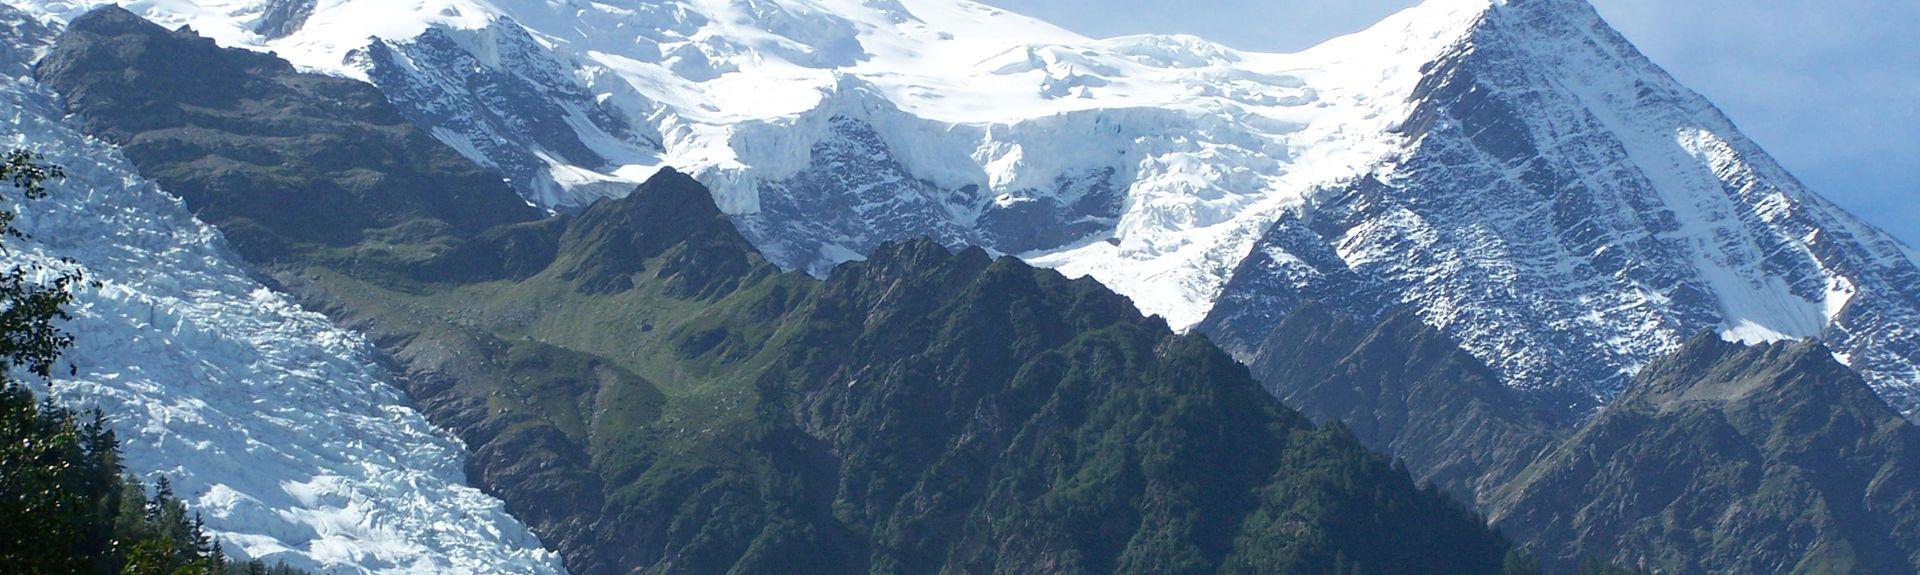 Fréterive, Auvergne-Rhône-Alpes, France